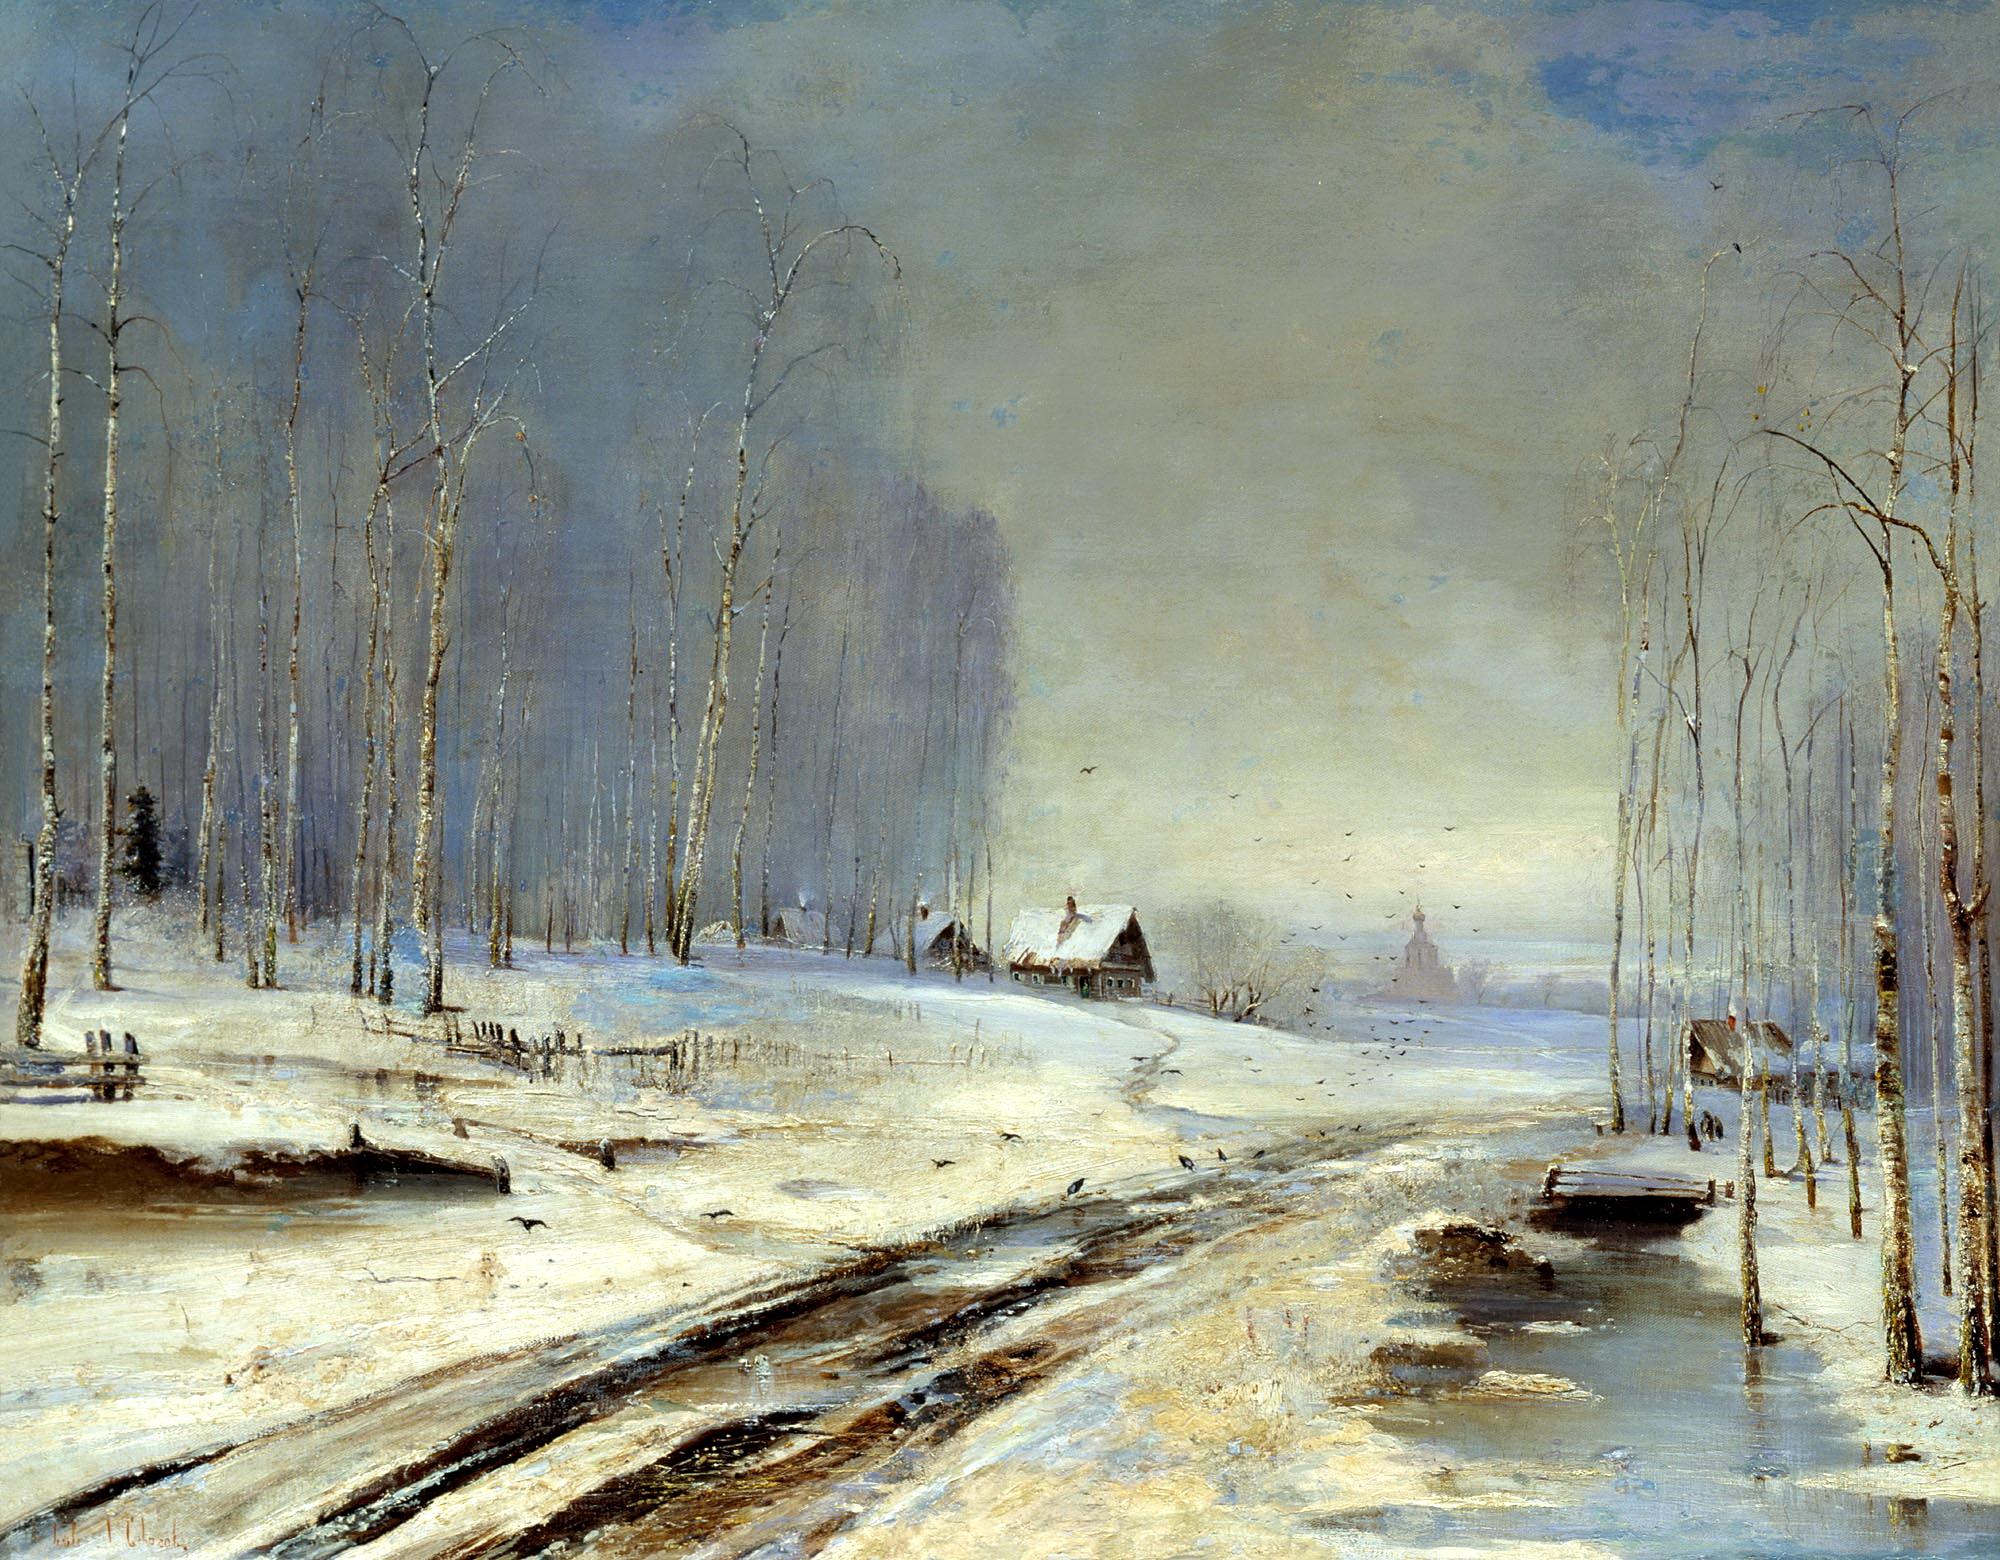 Алексей Саврасов картина Распутица зимний пейзаж холст масло